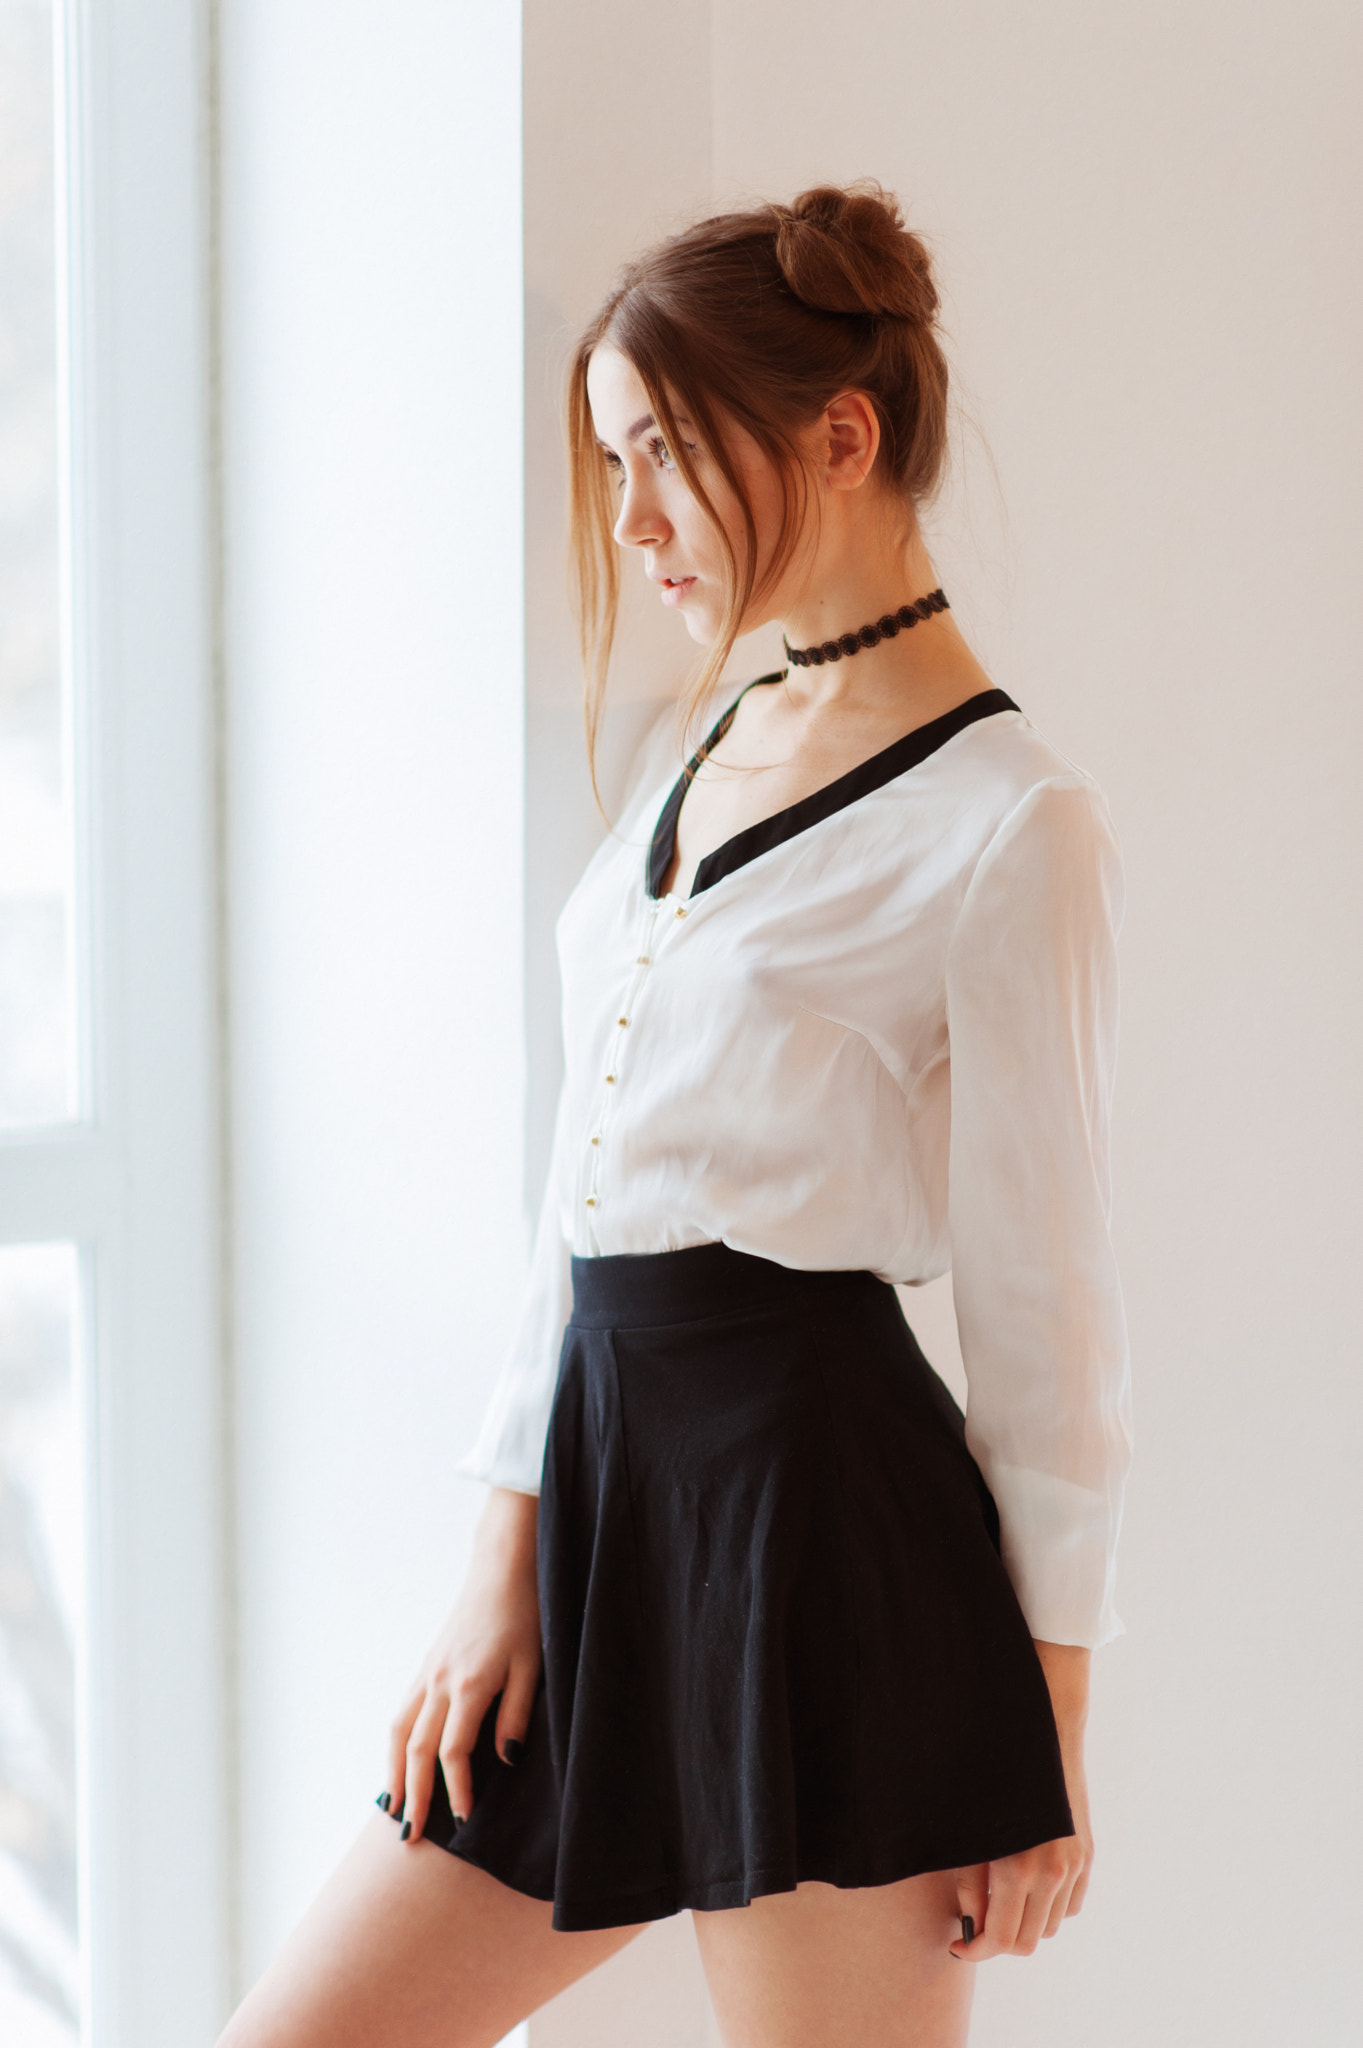 Maxim Maximov Women Ksenia Kokoreva Brunette Hairbun Looking Away Shirt Choker White Clothing Skirt  1363x2048